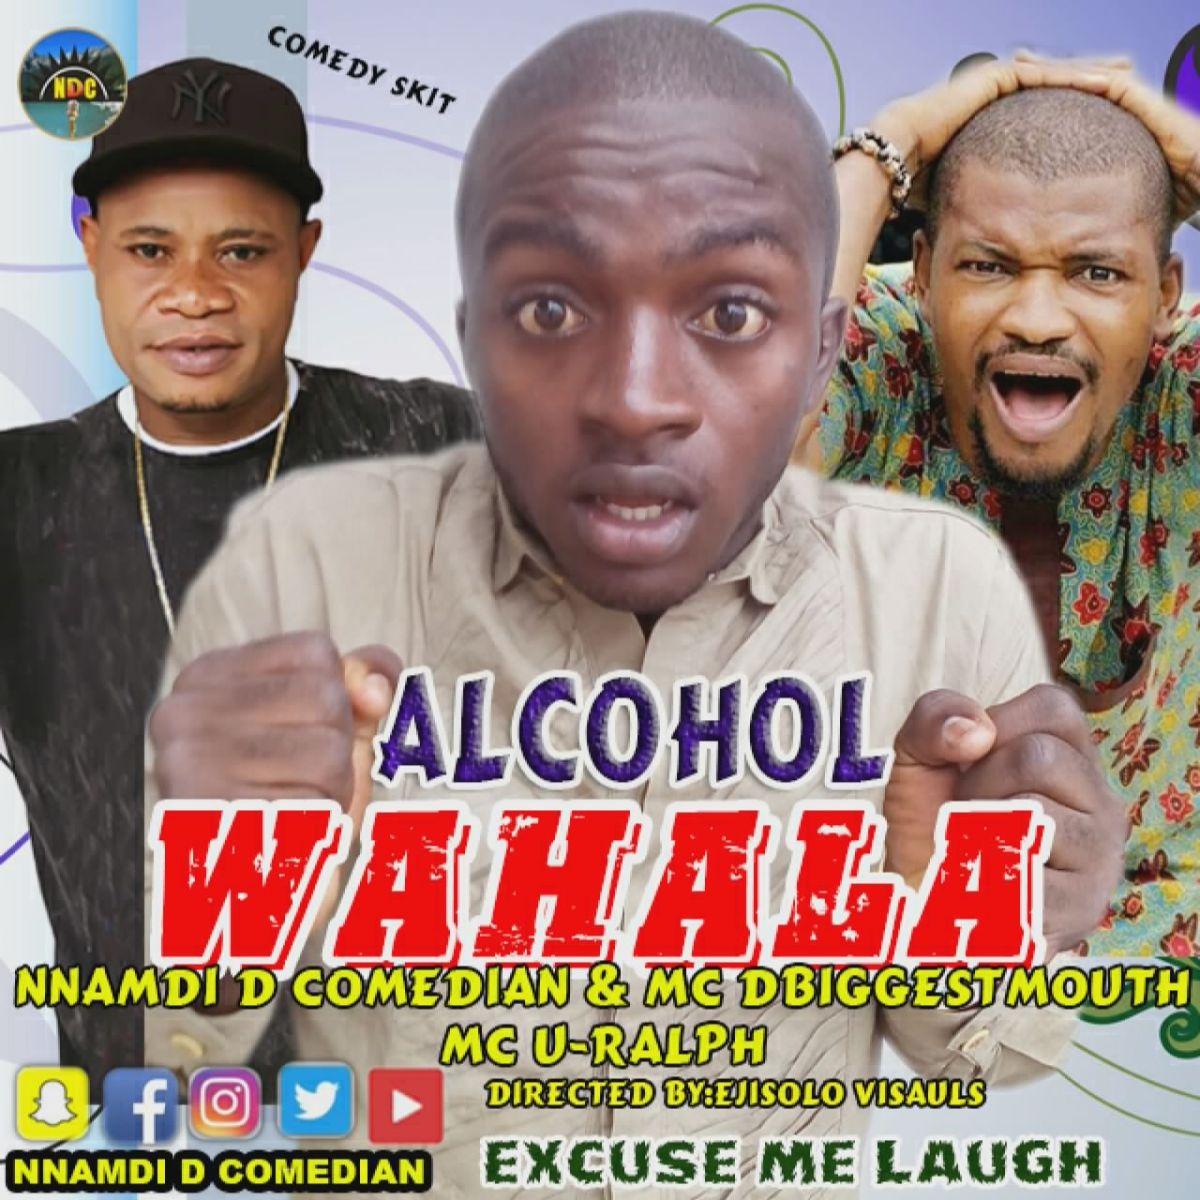 Video: Nnamdi D Comedian X Mc U-Ralph & DBiggest Mouth – AlcoholWahala